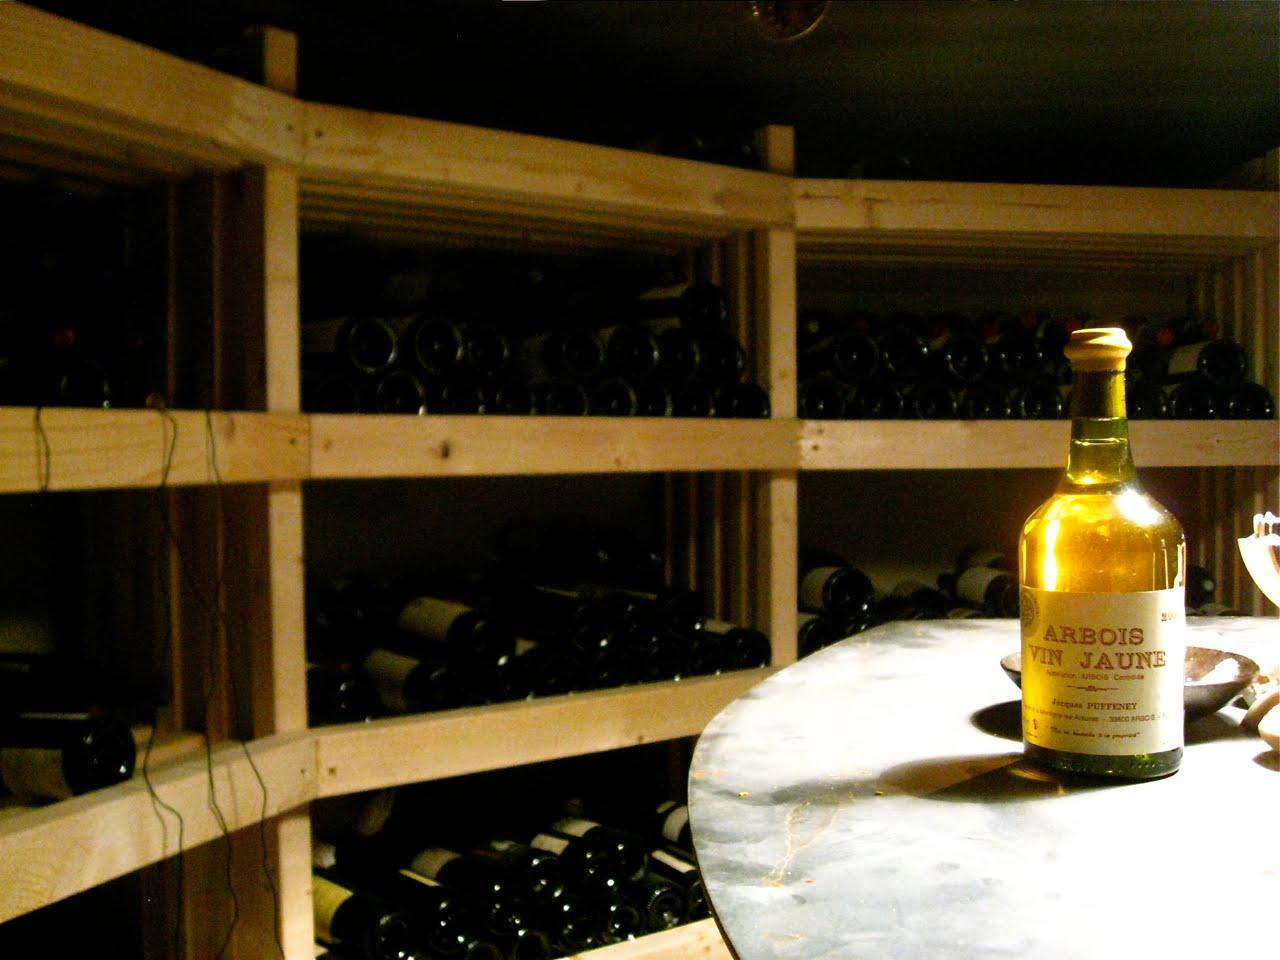 Finare Vinare: En egen vinkällare